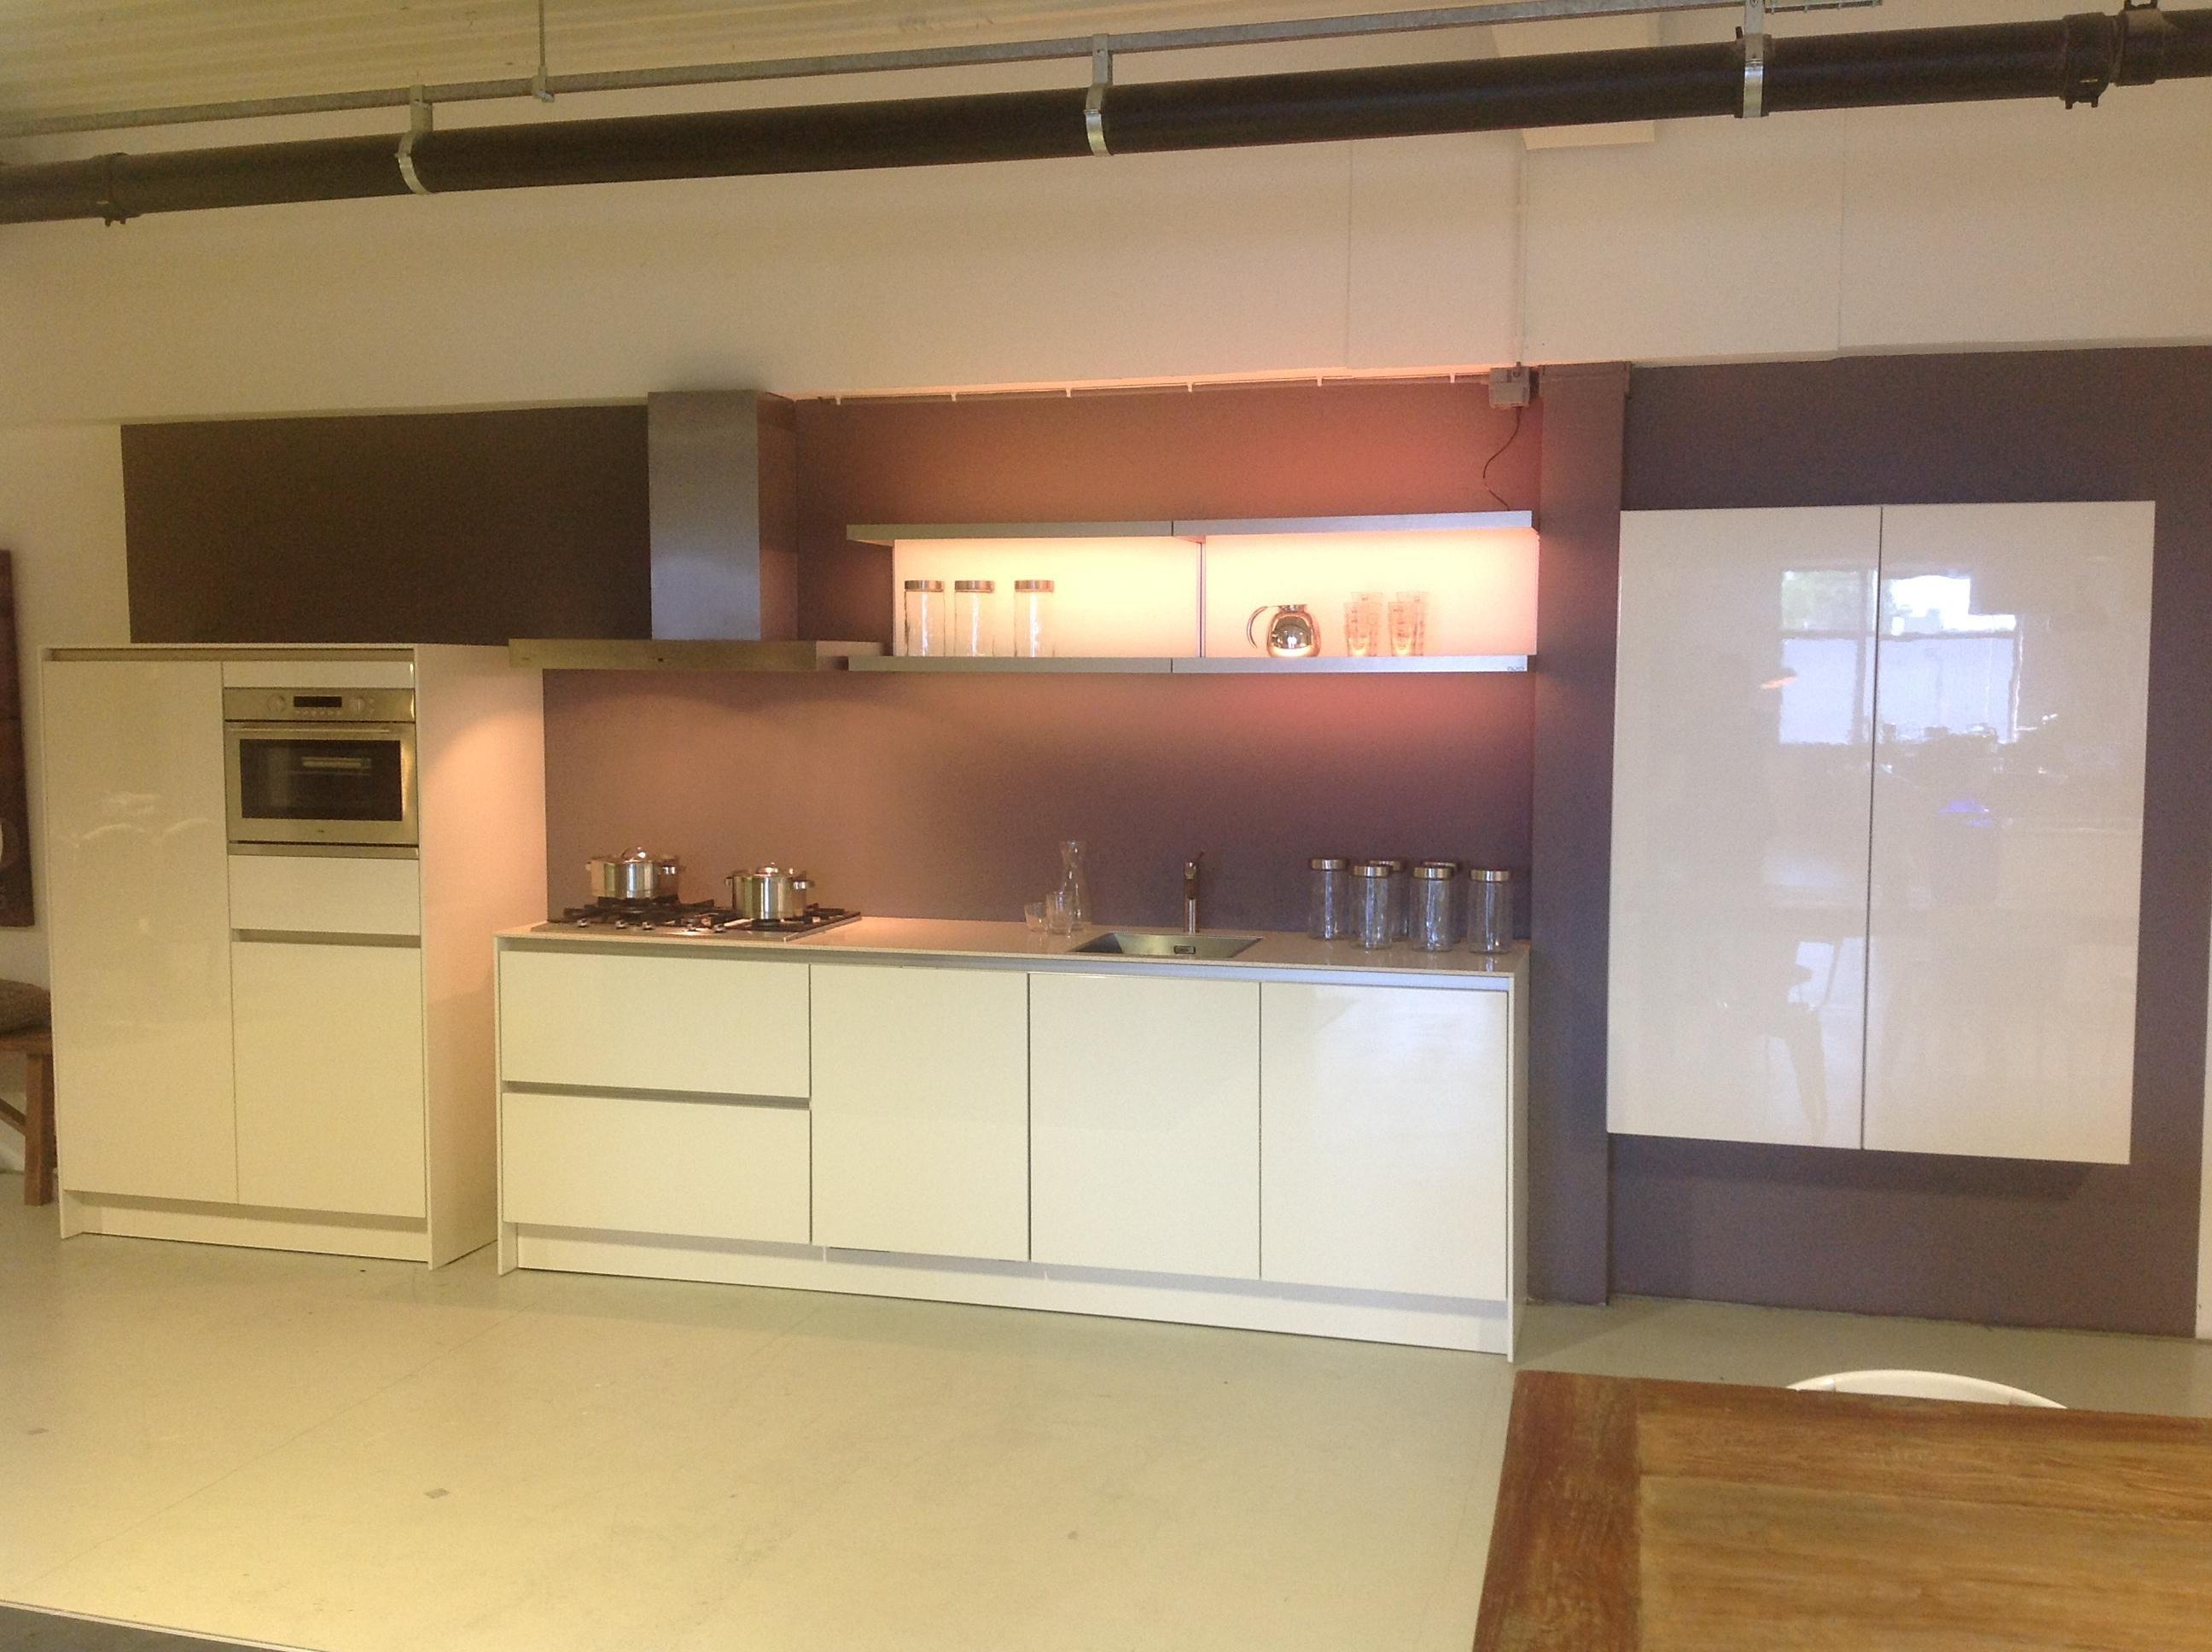 Siematic Keuken Aanbieding – Atumre com